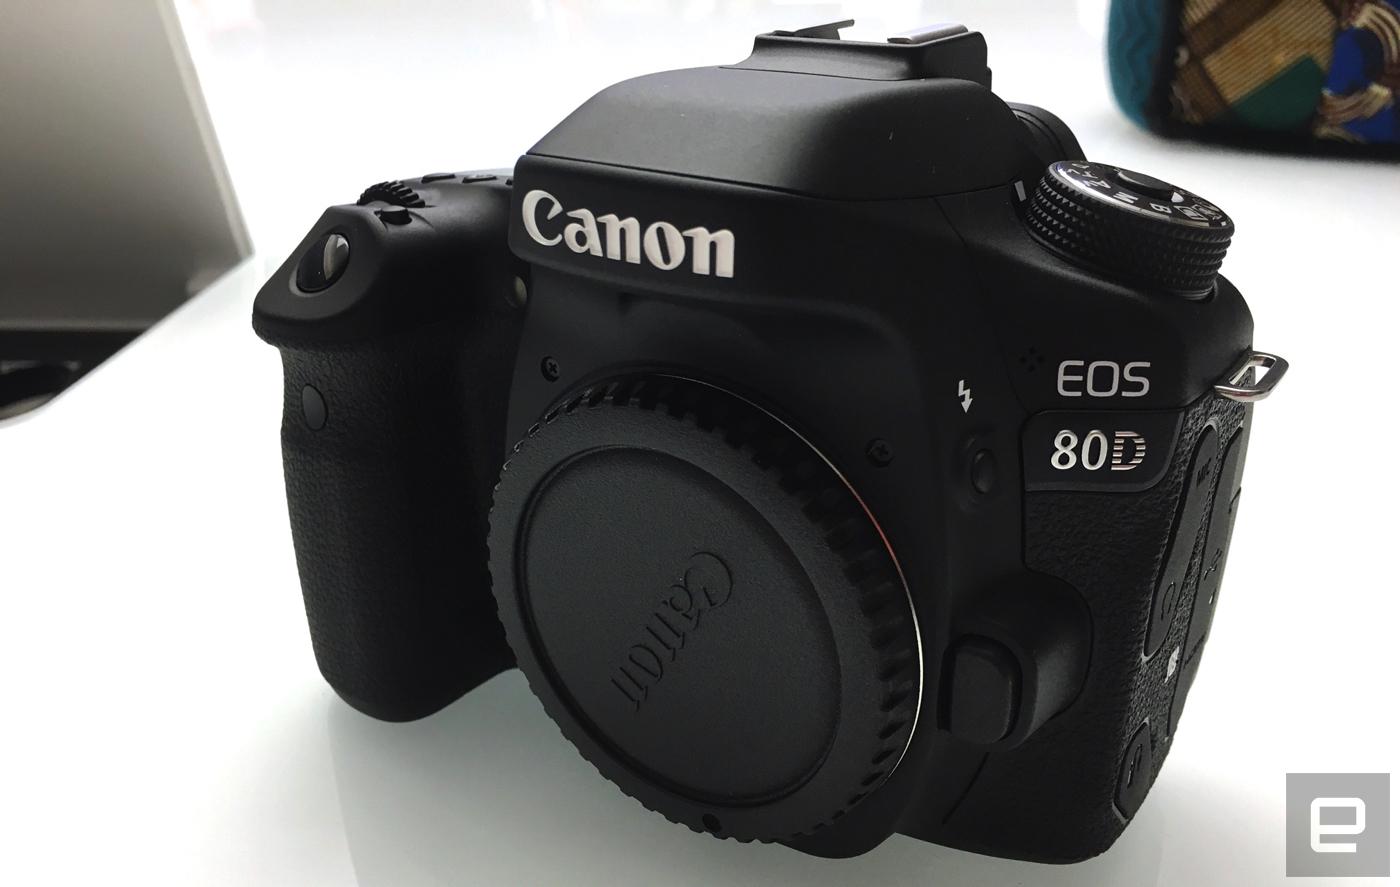 La Canon EOS 80D llega para renovar la gama semiprofesional